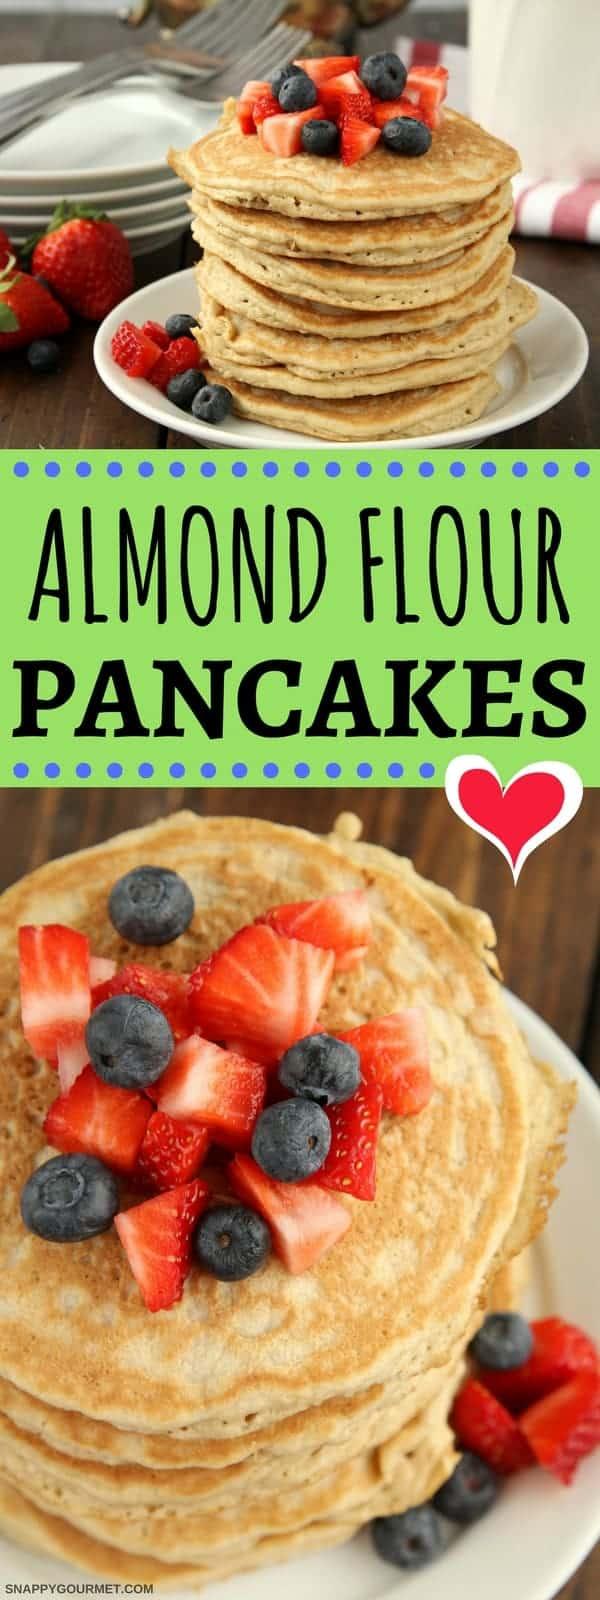 Almond Flour Pancakes - easy gluten free pancakes made in a blender!